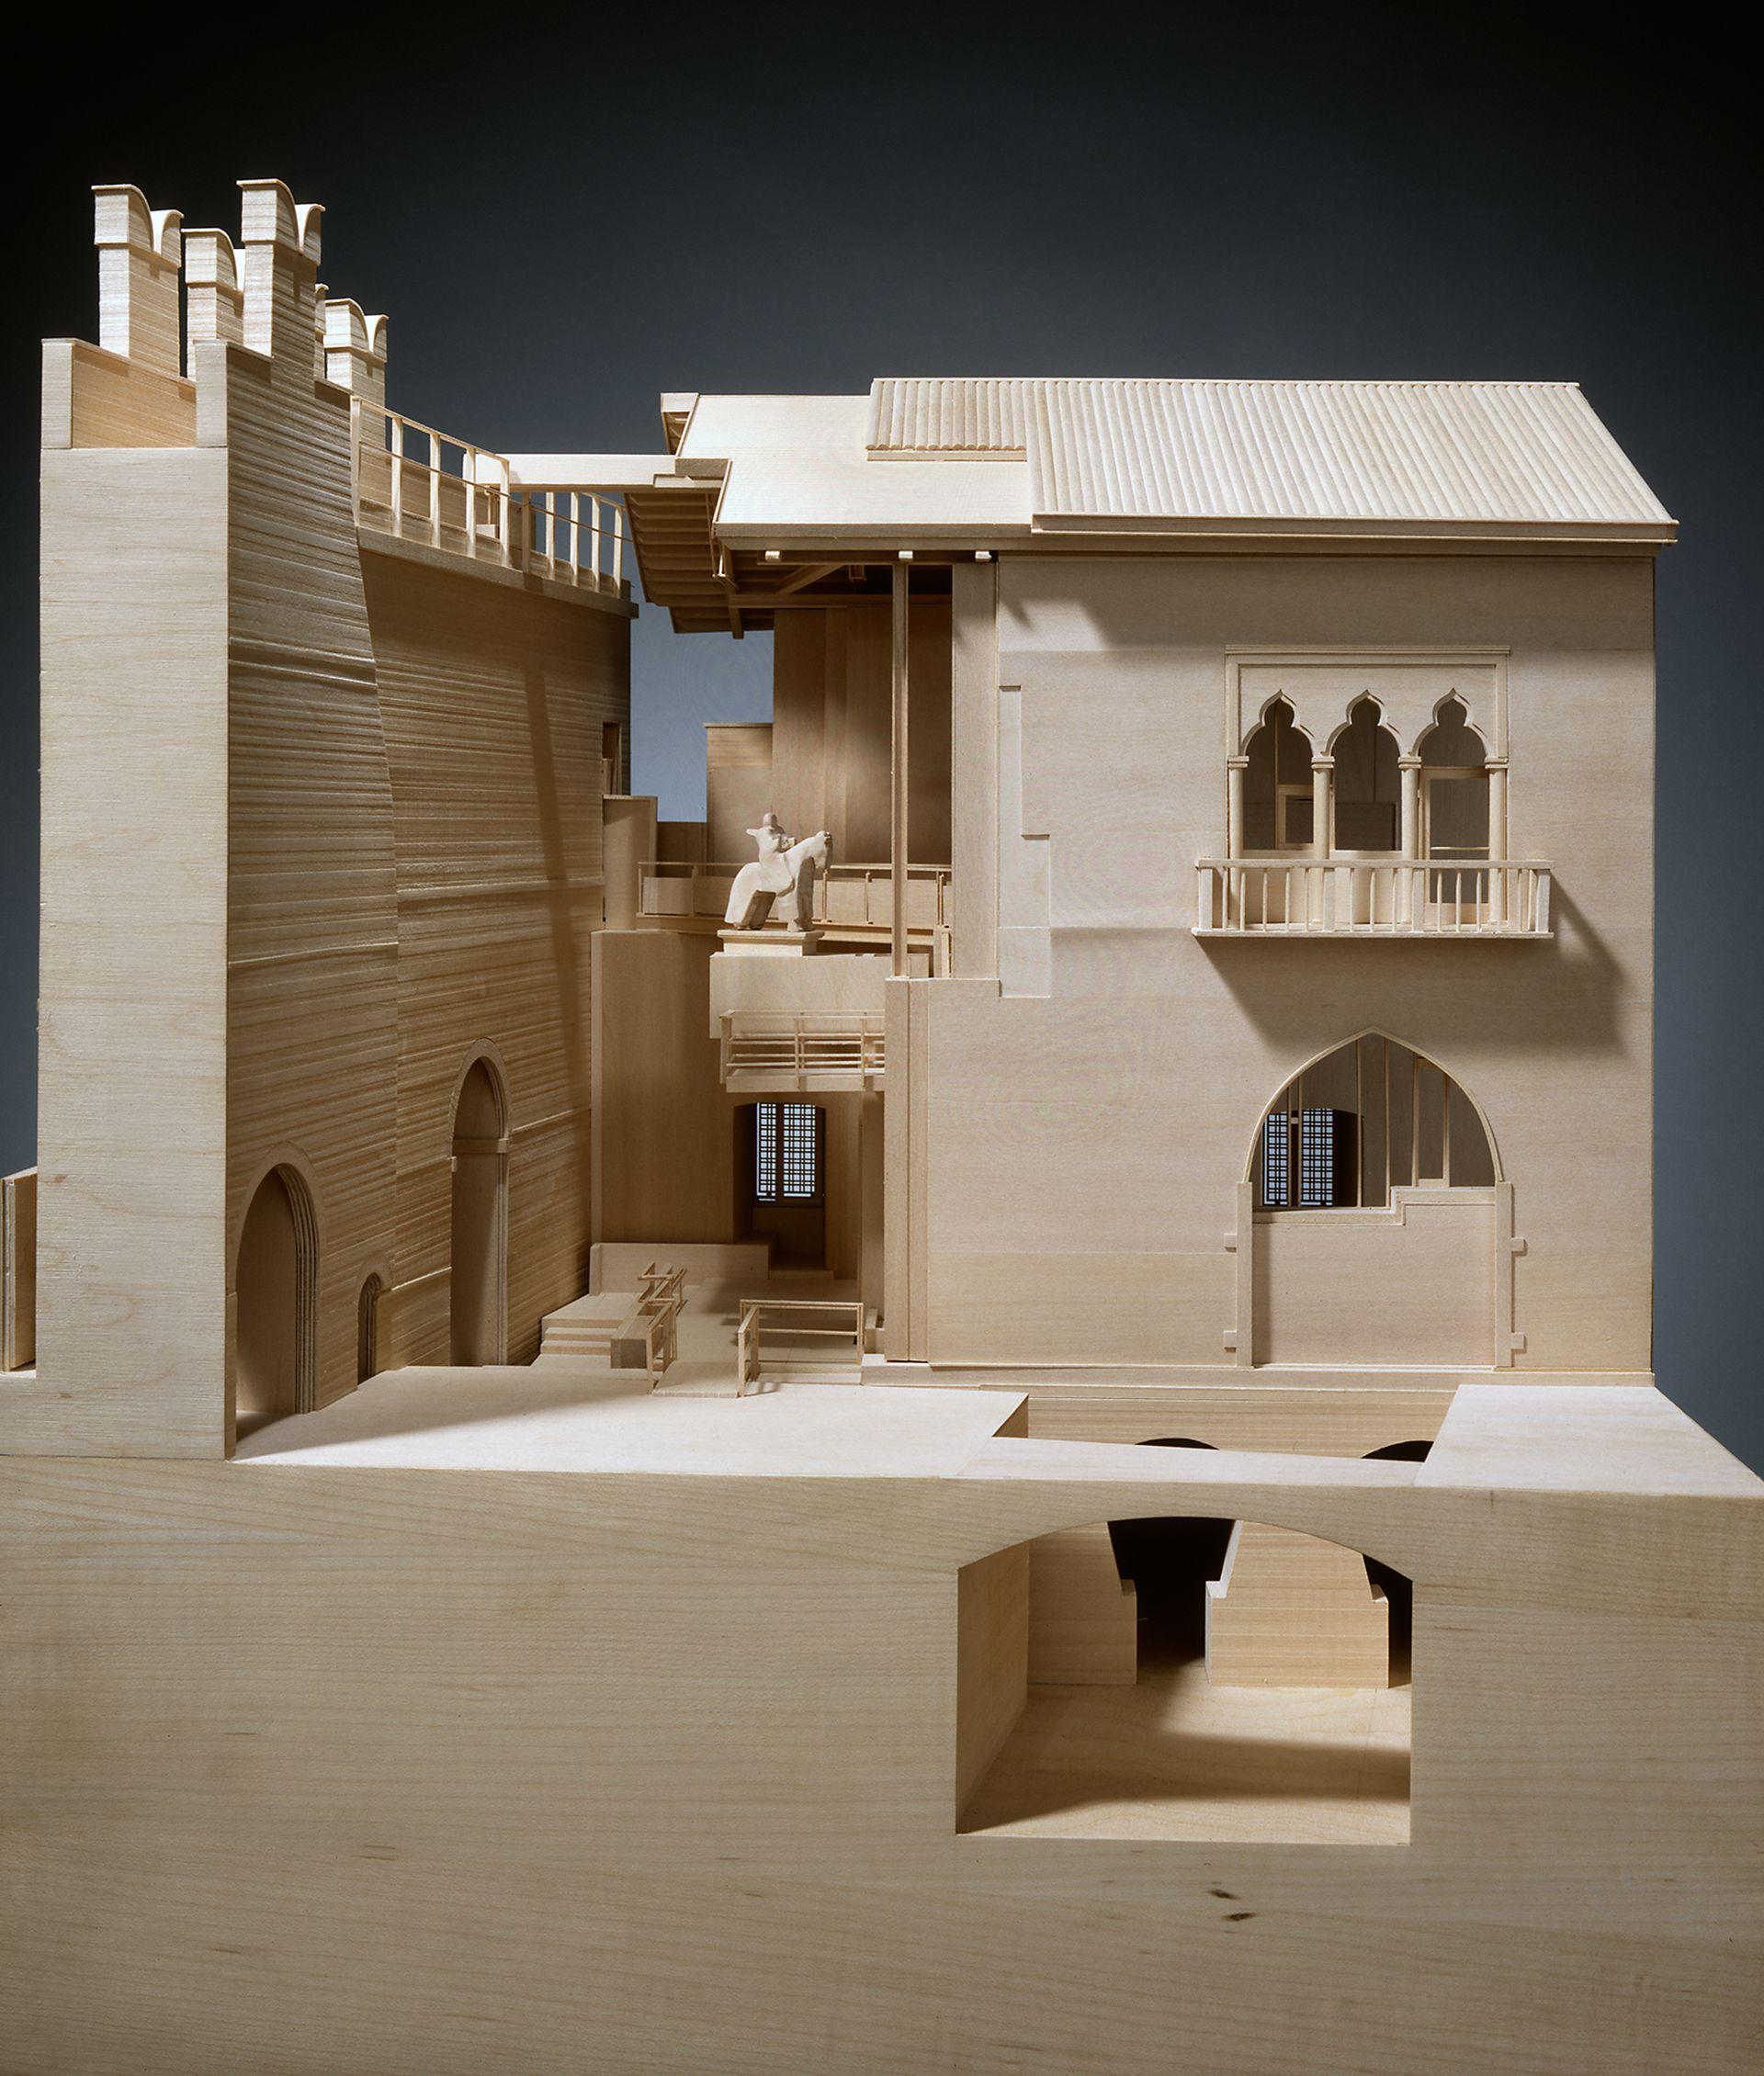 Carlo Scarpa, Architect: Intervening With History